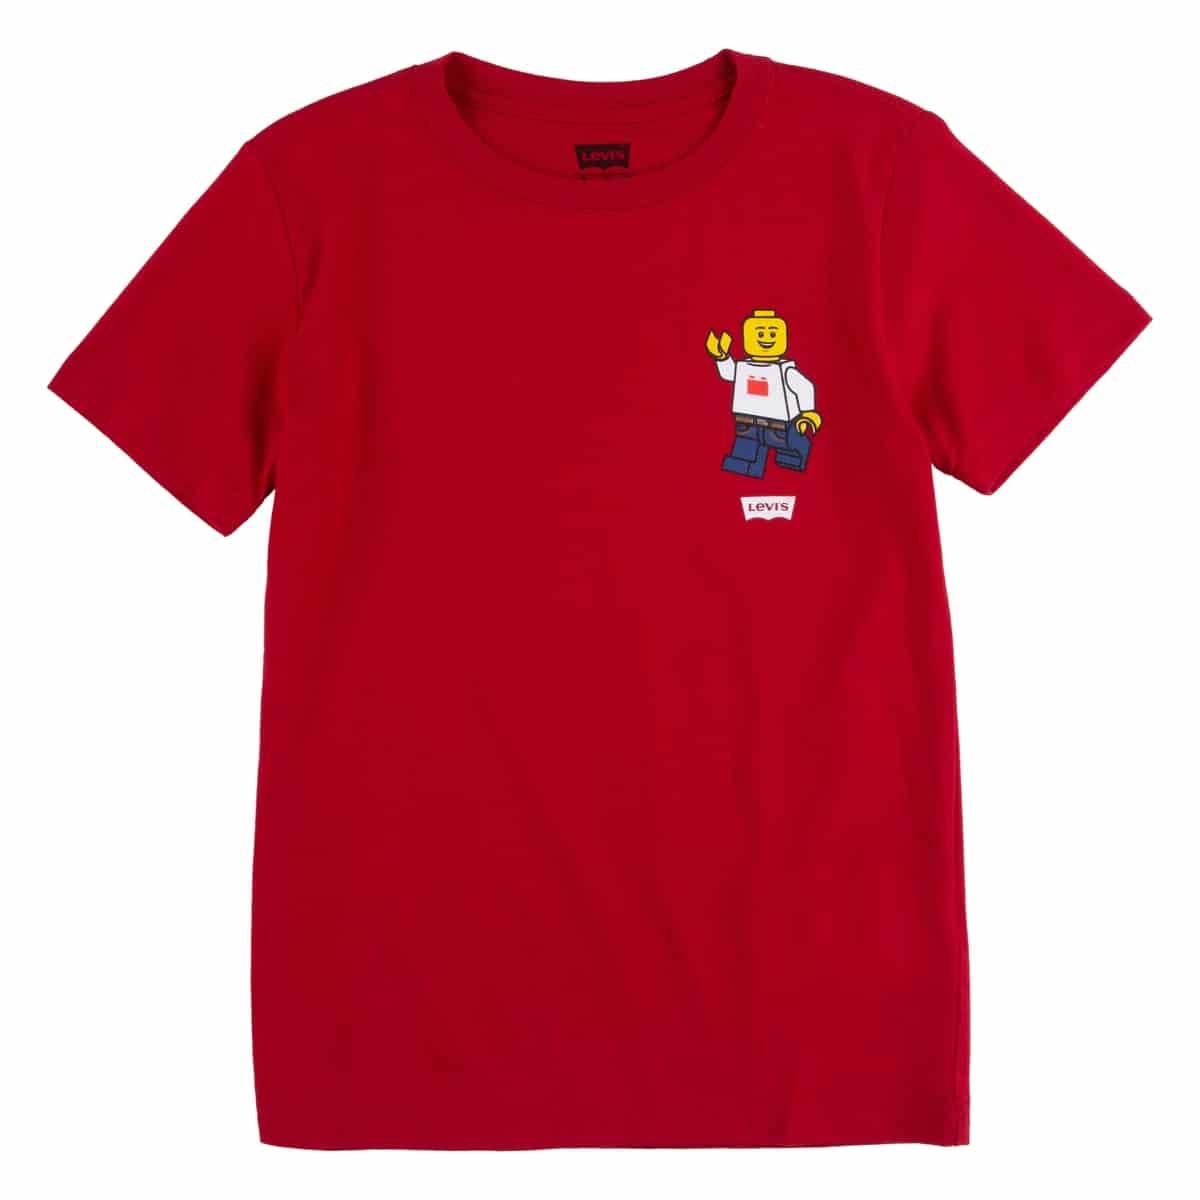 levis x lego 5006406 logo t shirt 8 14